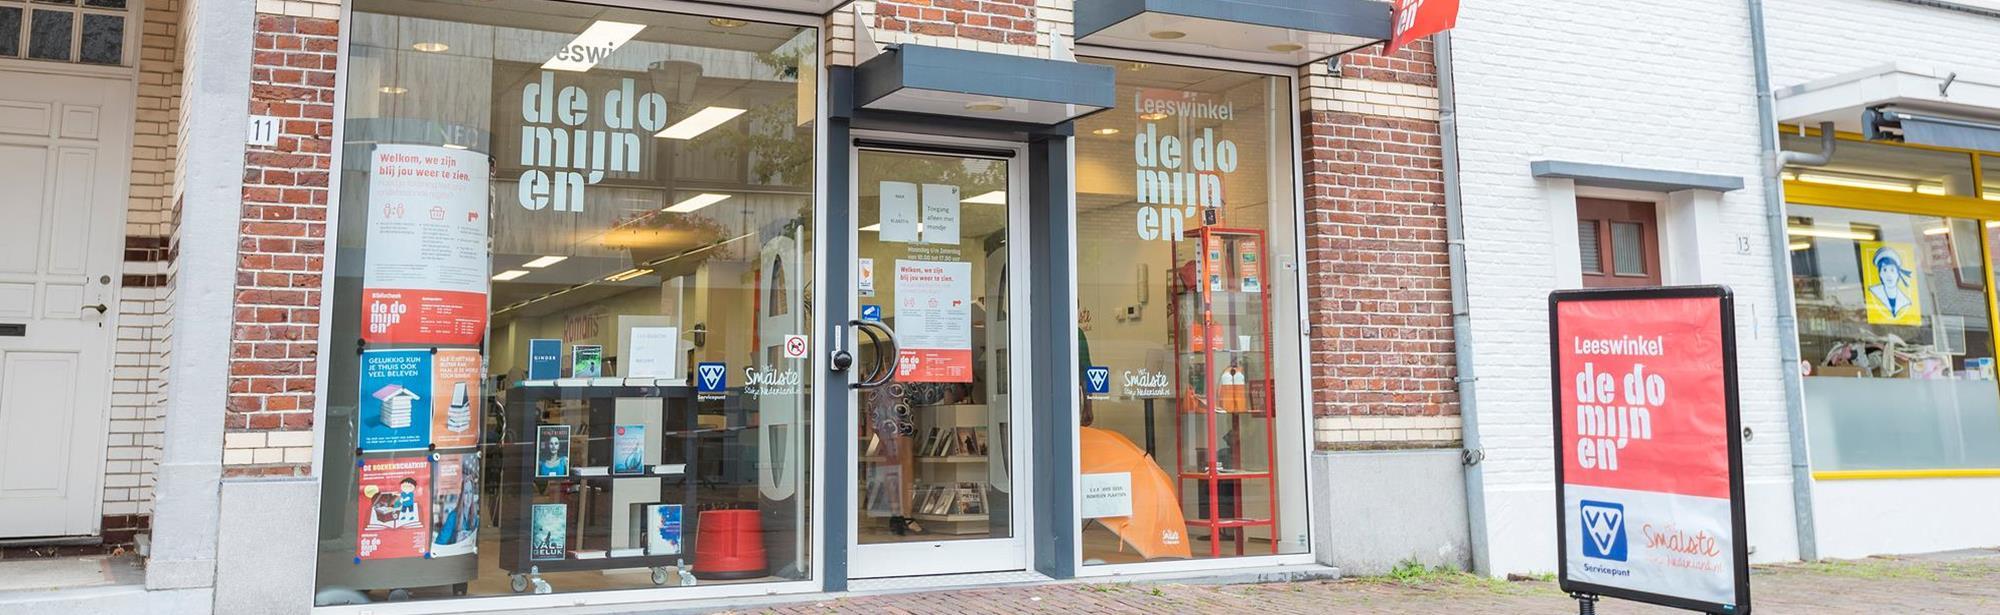 Visit Zuid-Limburg Servicepunt Echt, De Domijnen